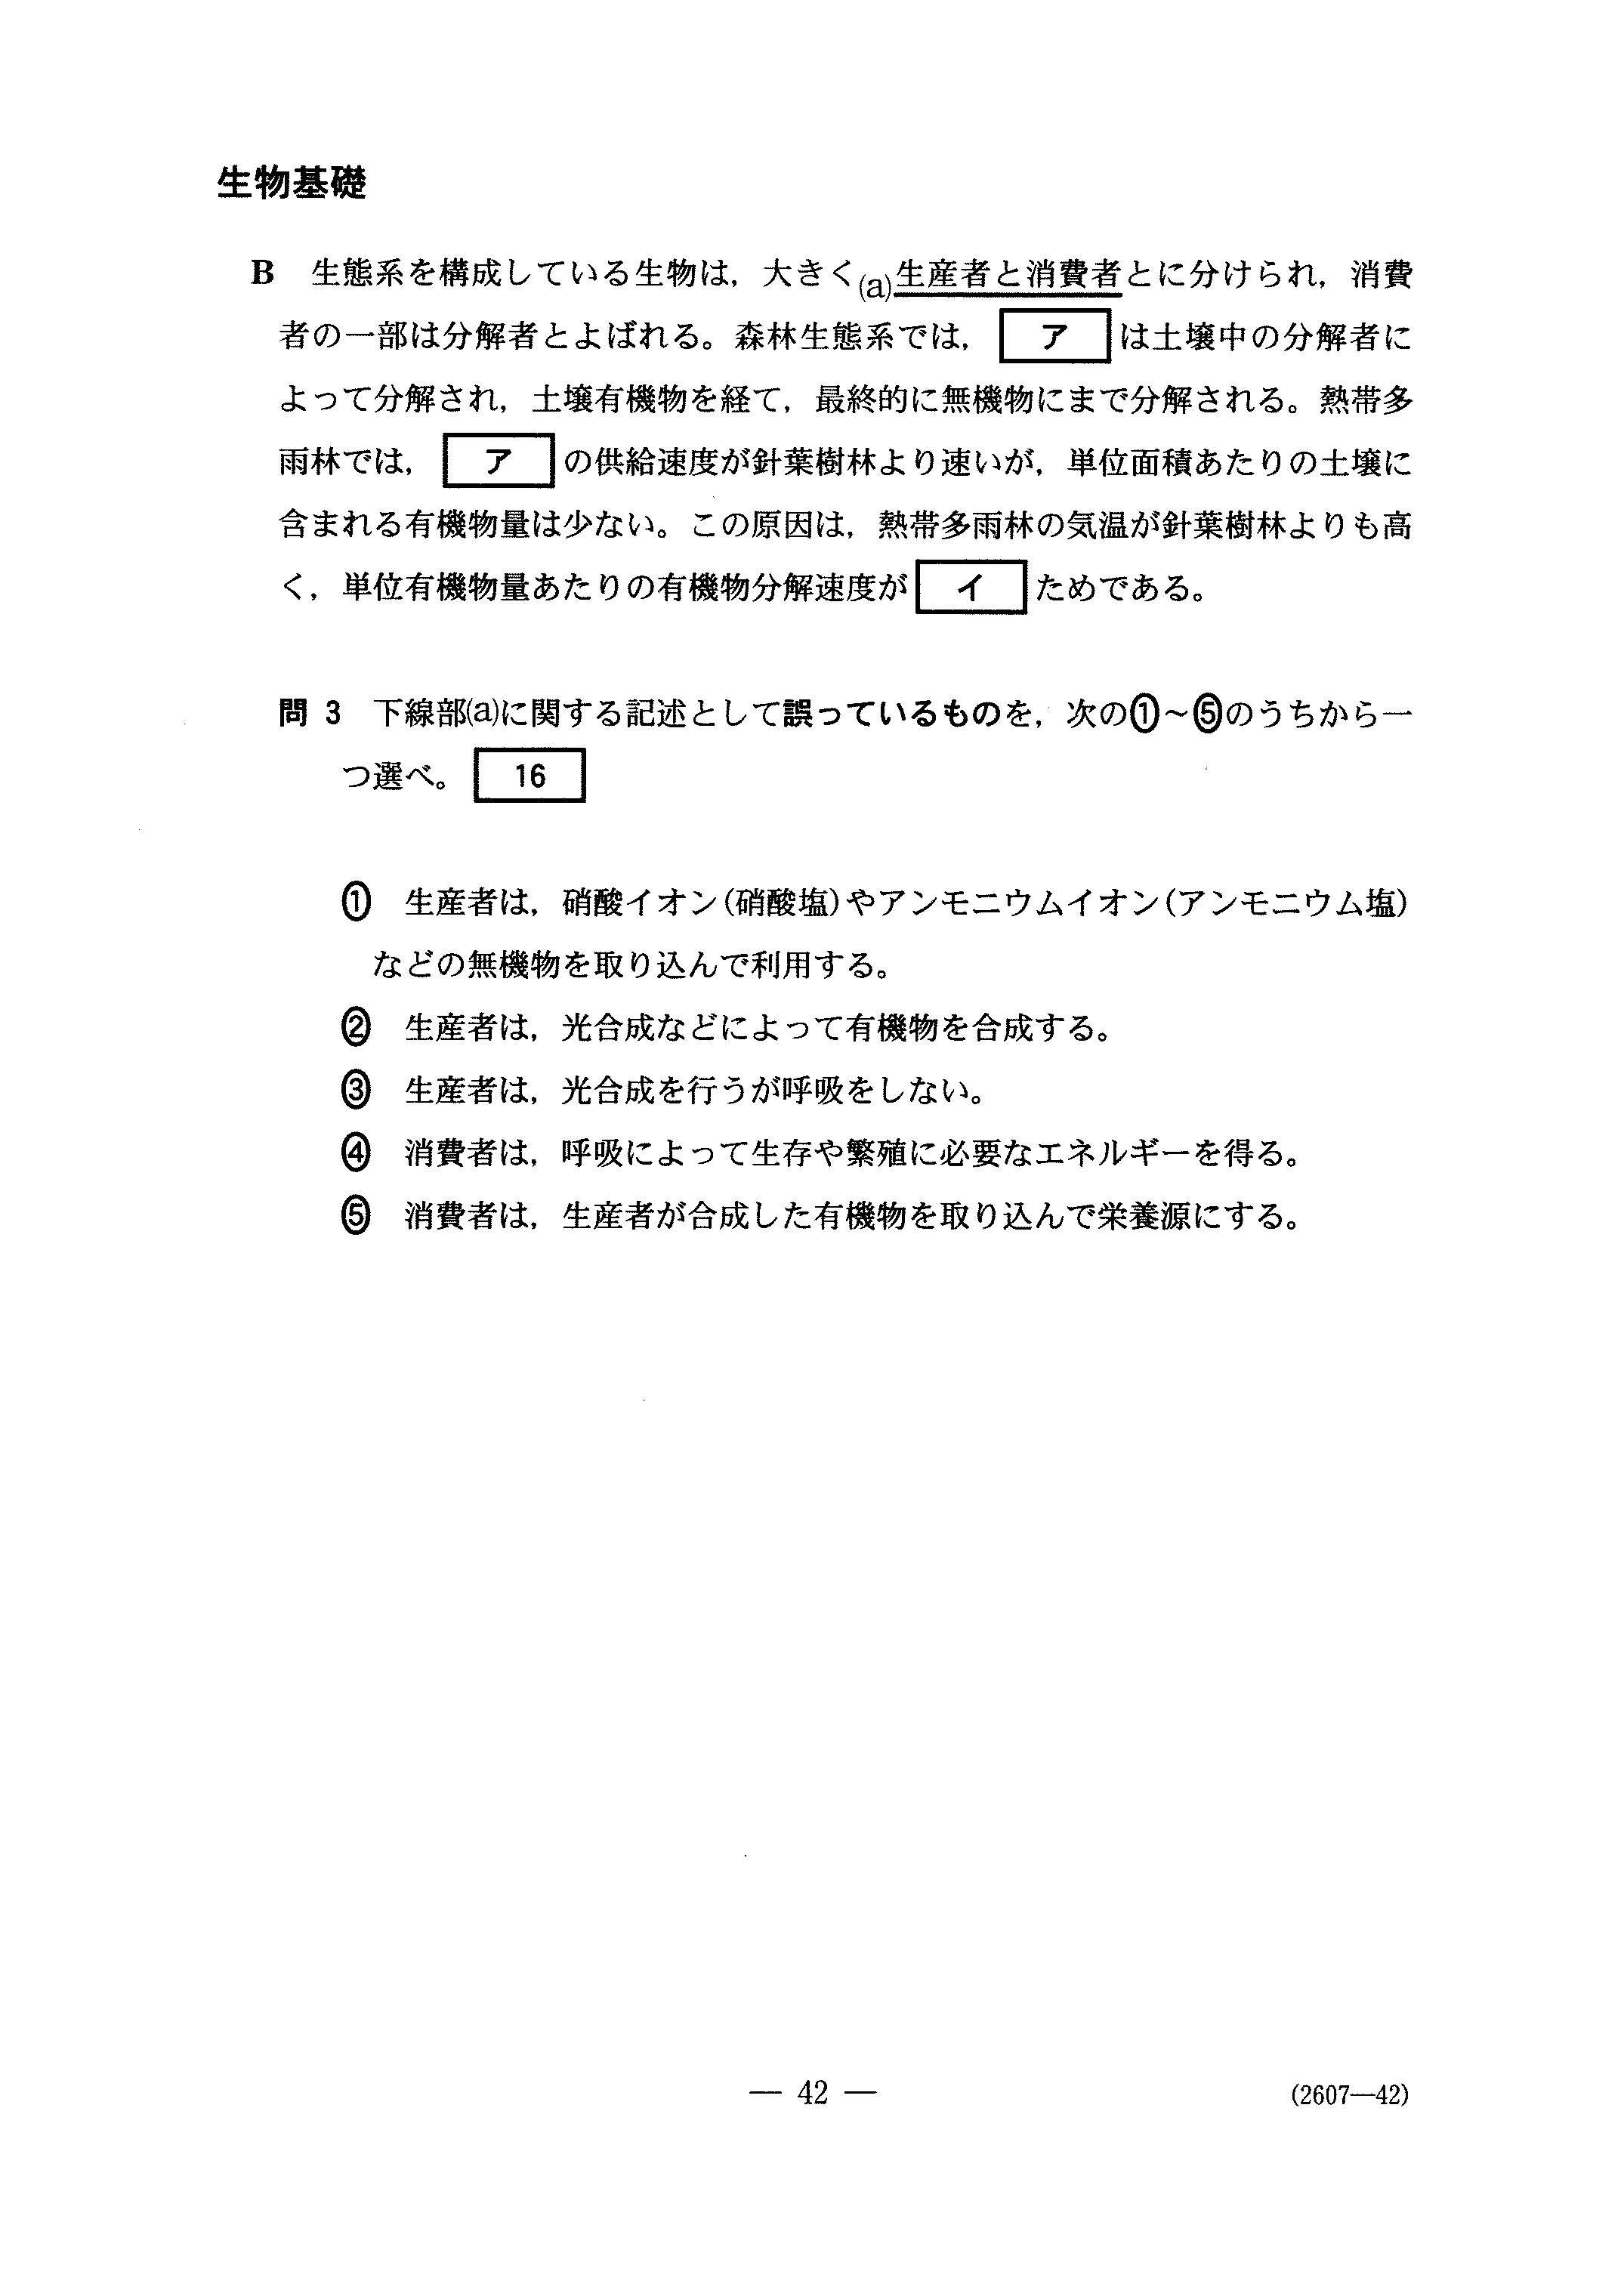 H29理科_生物基礎 大学入試センター試験過去問